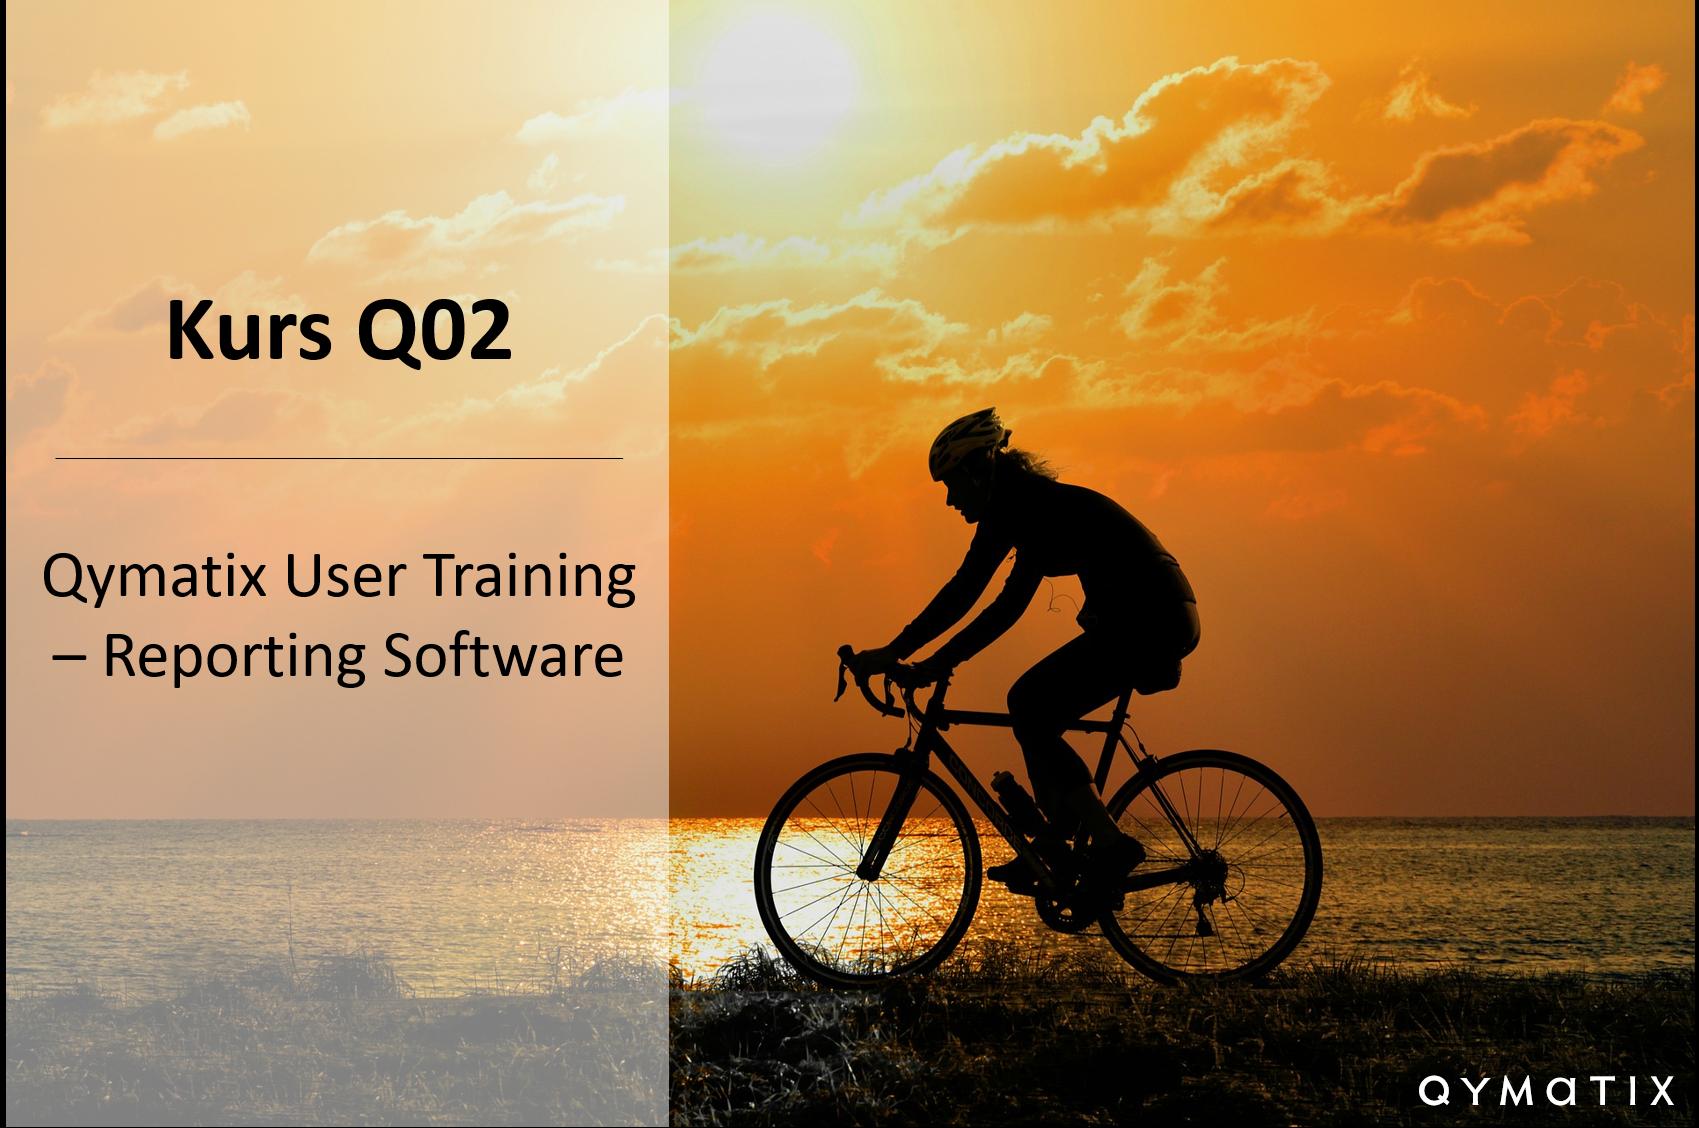 Qymatix Reporting Software: User Training – Q02